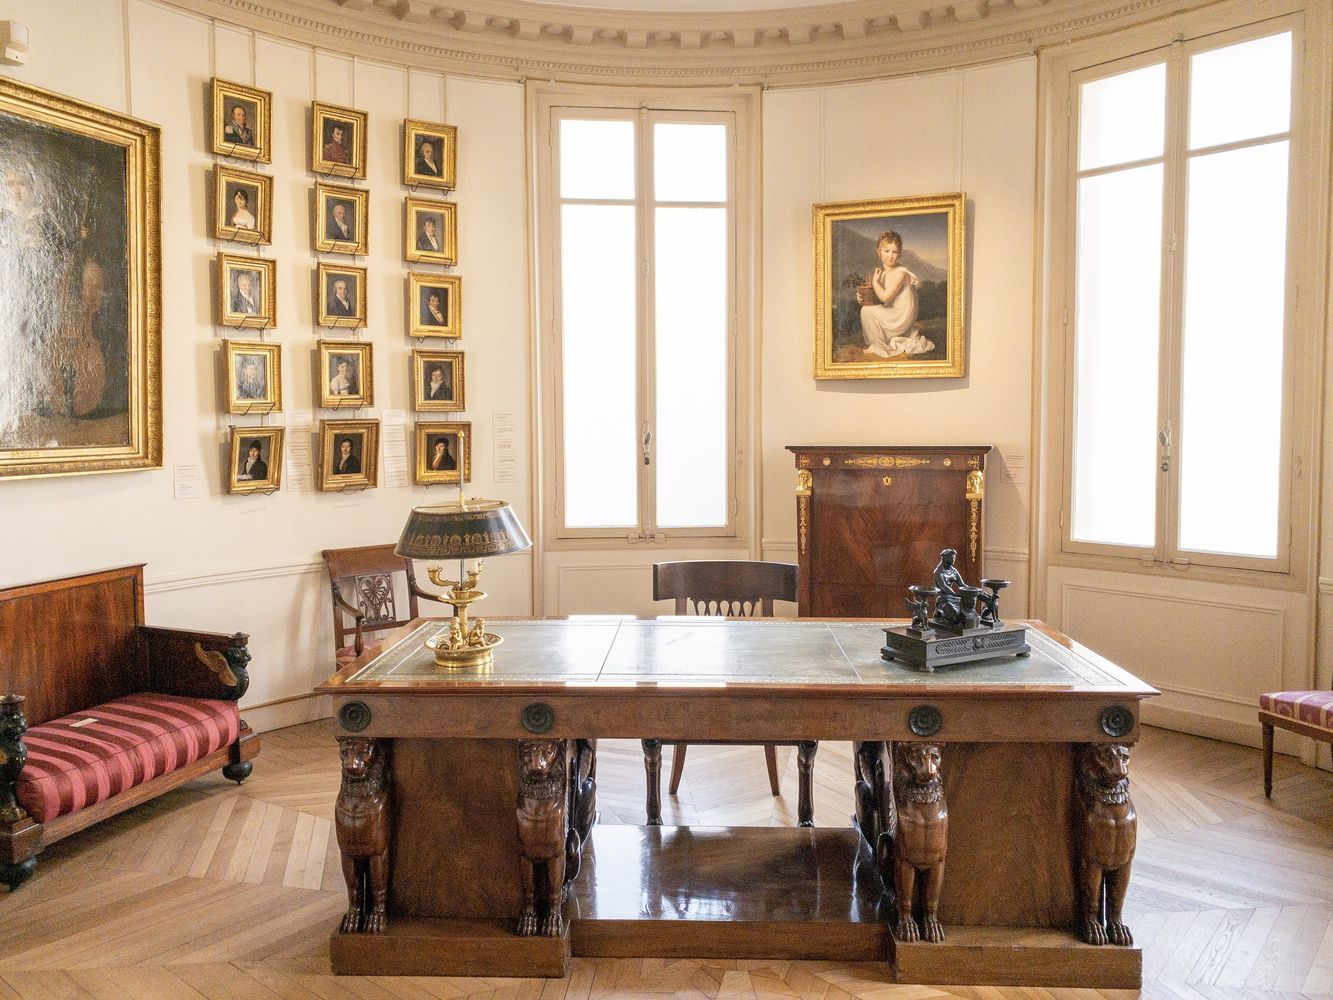 Musee Marmottan Monet - upstairs 19th century office